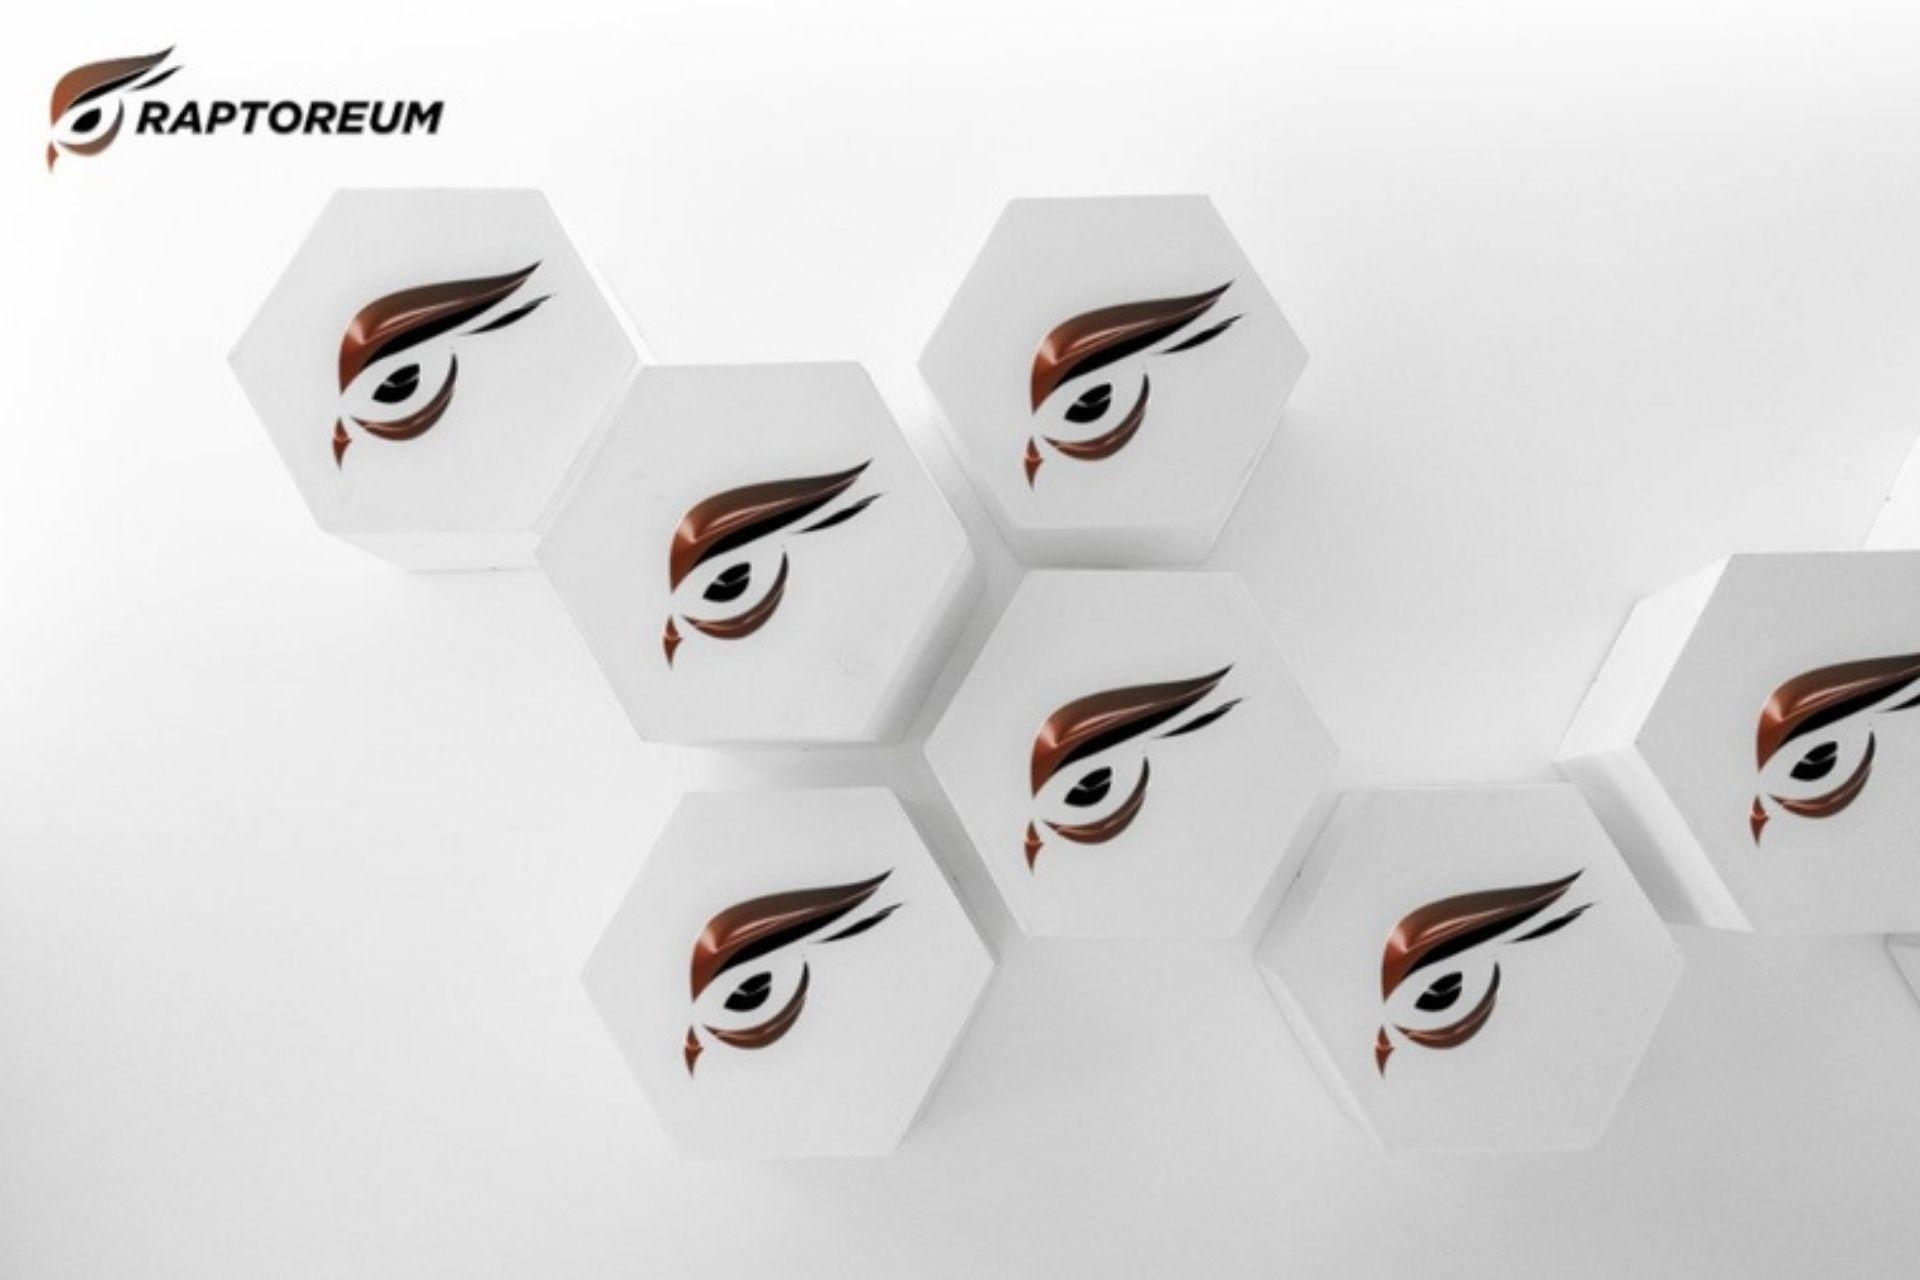 Raptoreum | A Trustless and Attack Immune Network Decentralizing Mining